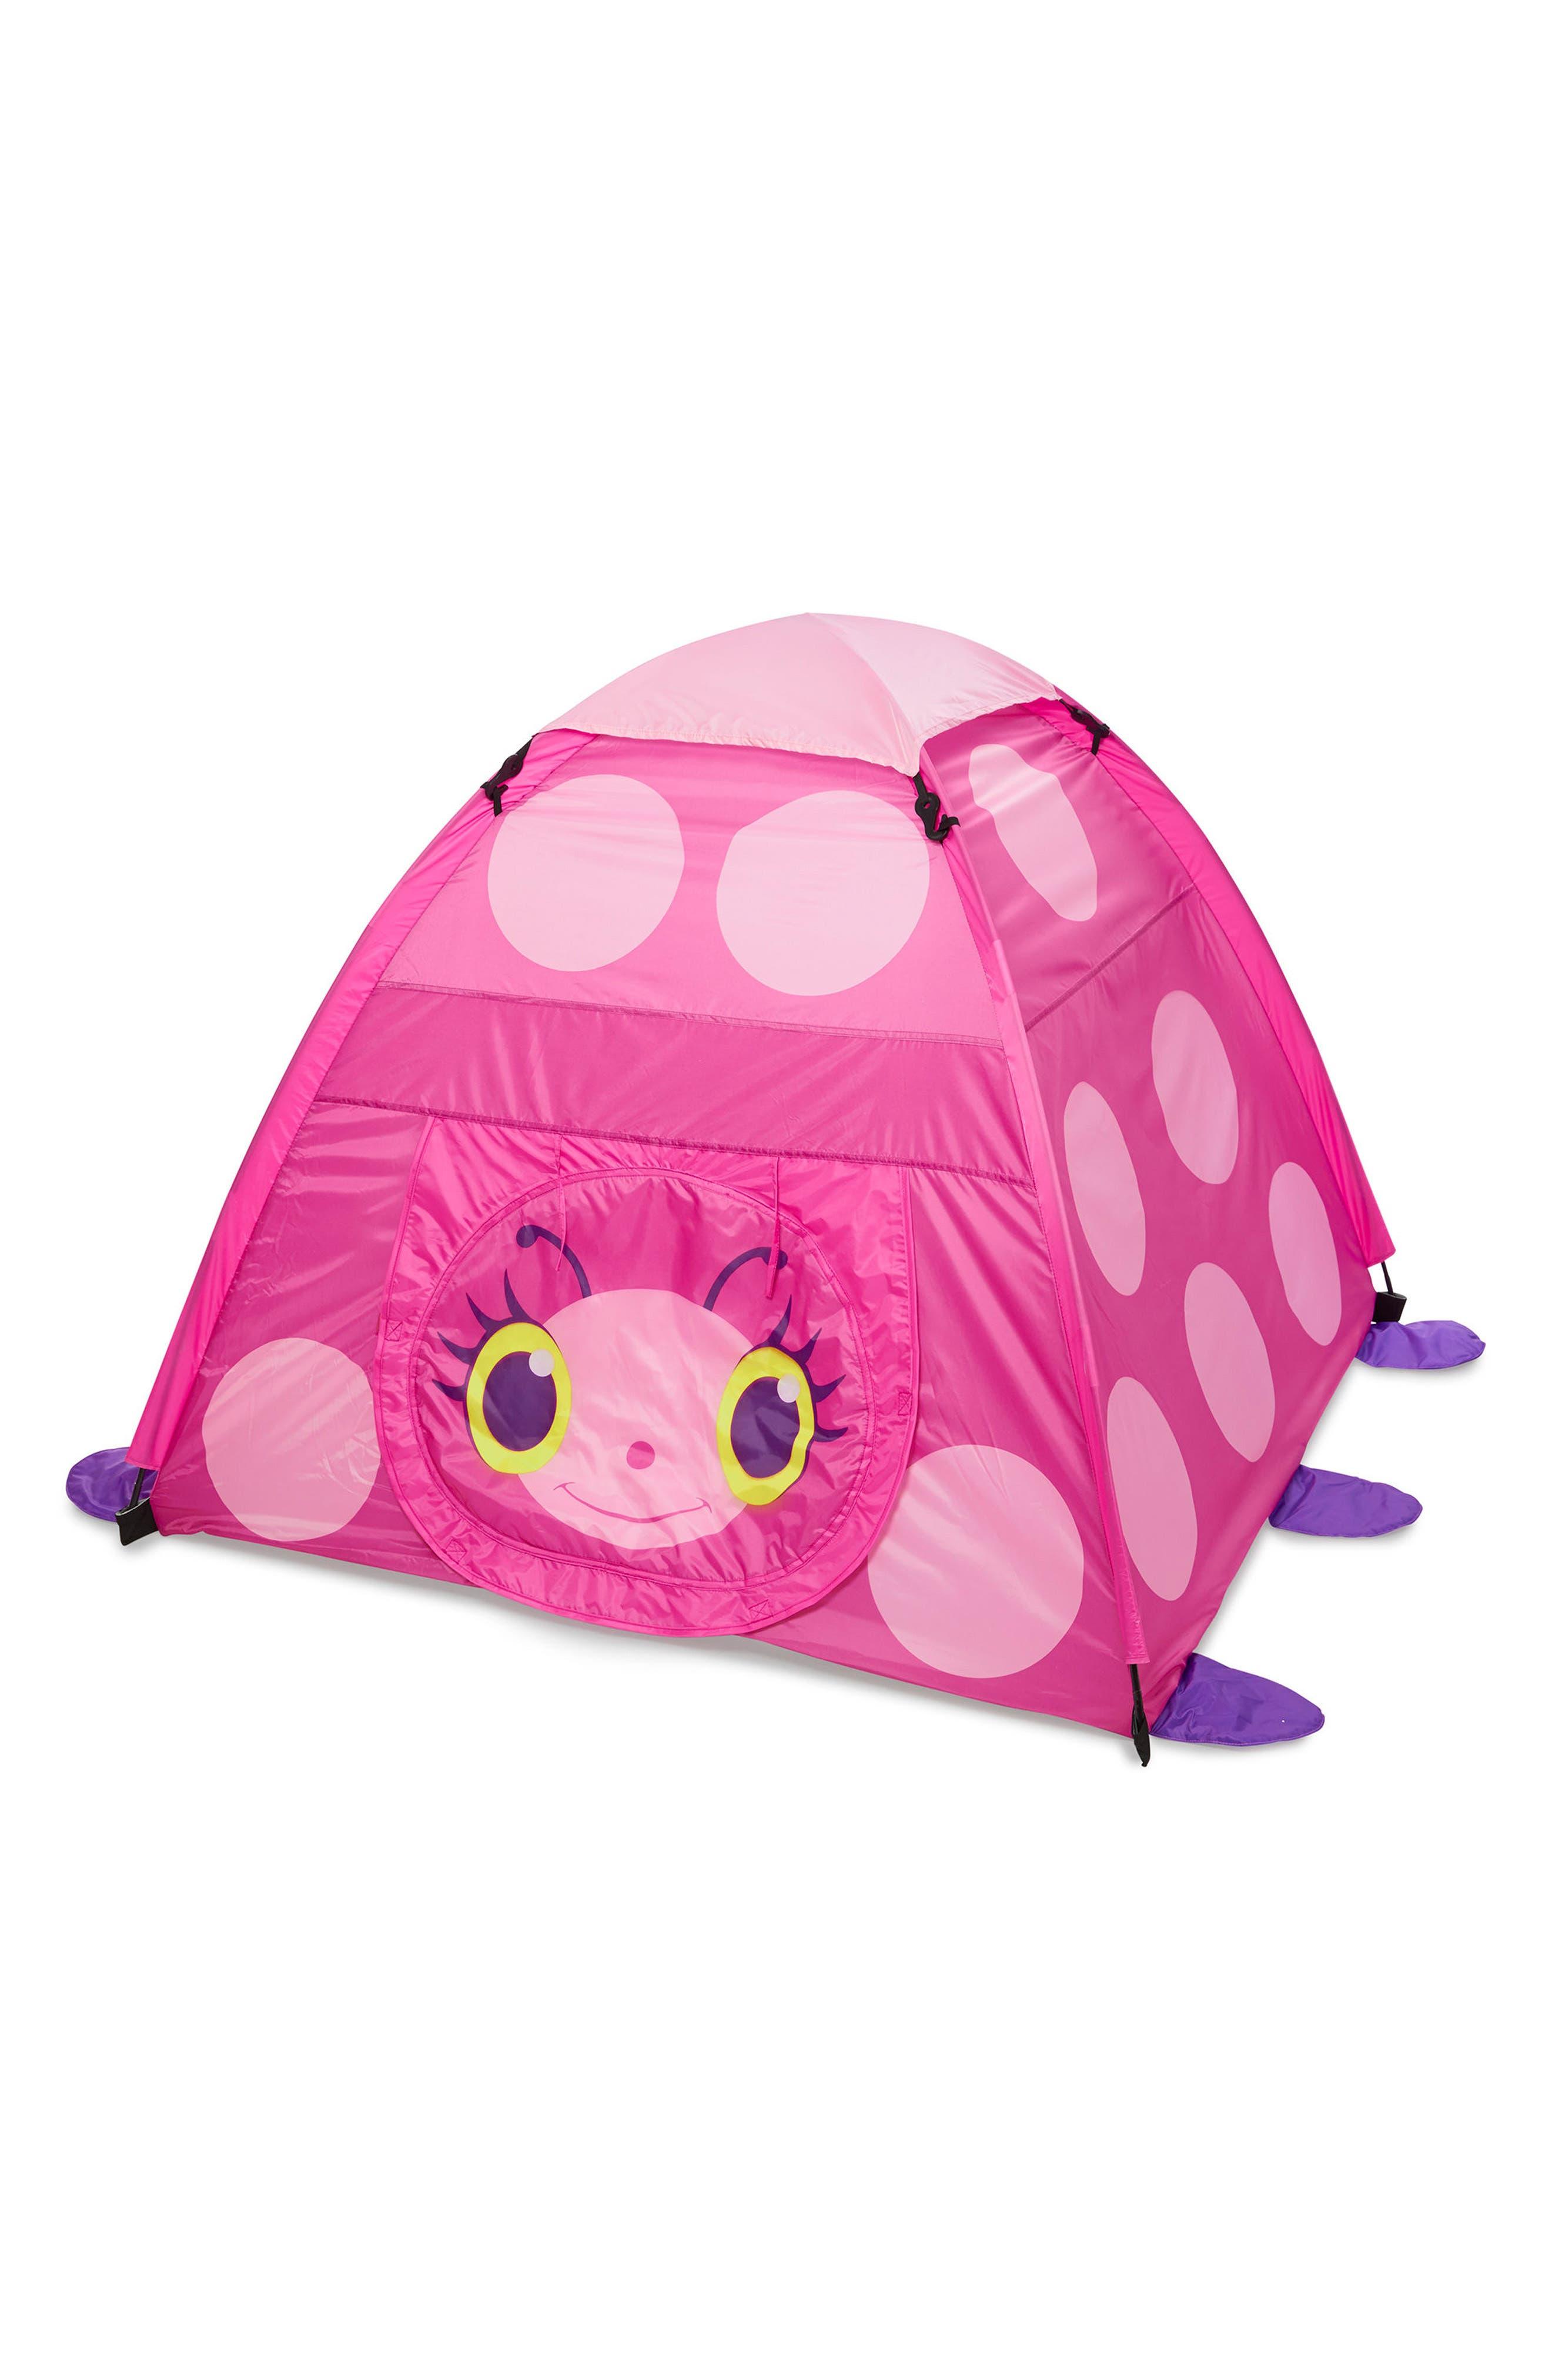 Melissa & Doug Trixie Ladybug Tent